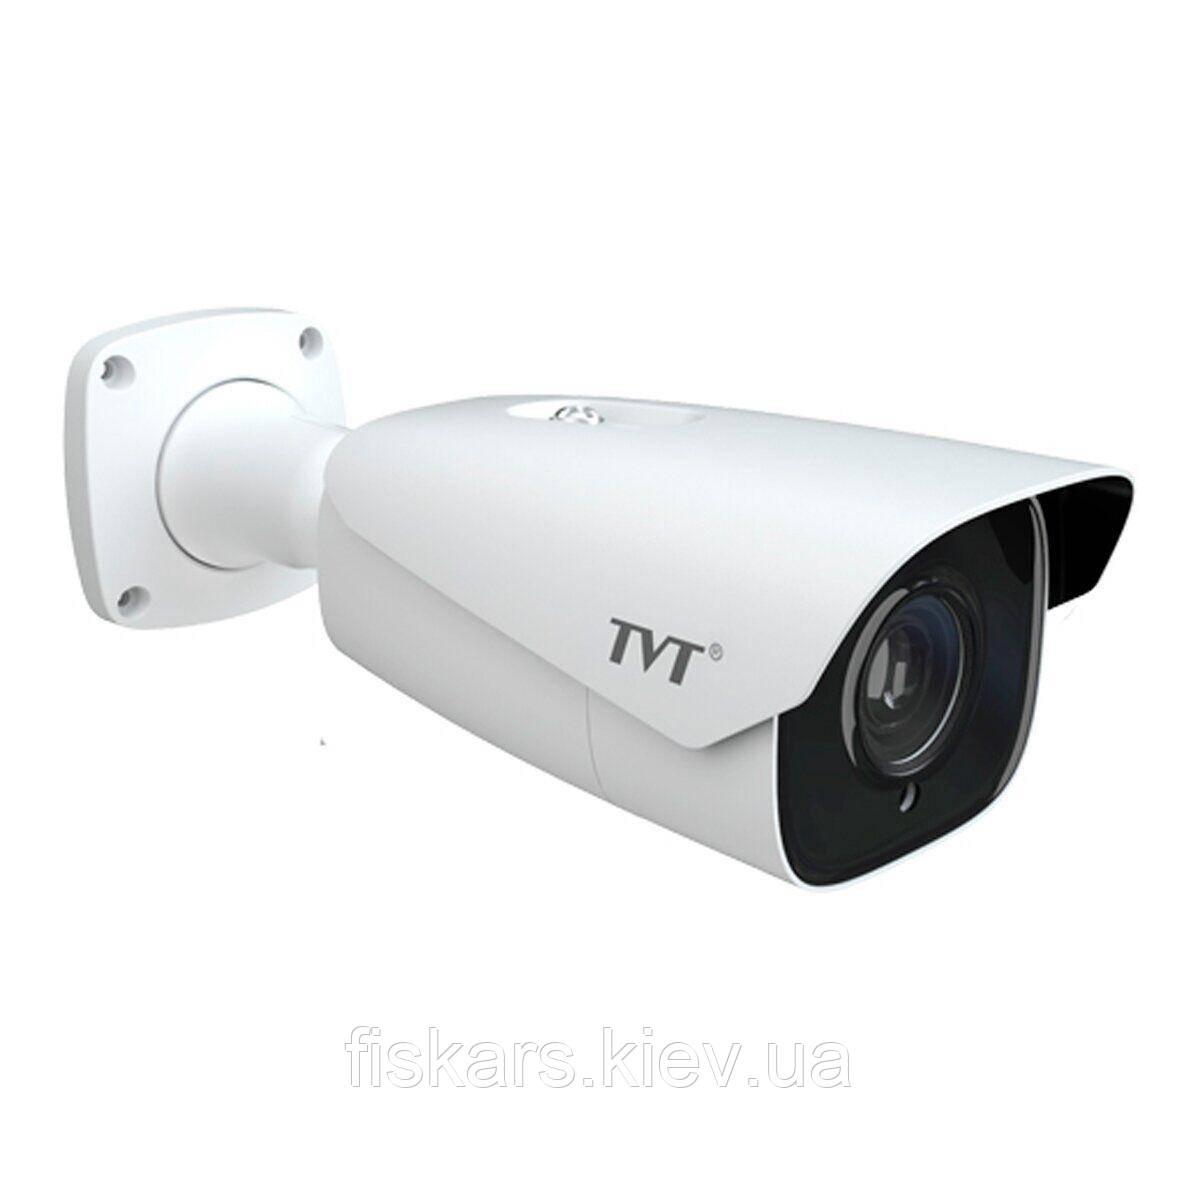 8 Мп IP-камера TVT Digital TD-9483S3 (D/AZ/PE/AR5)